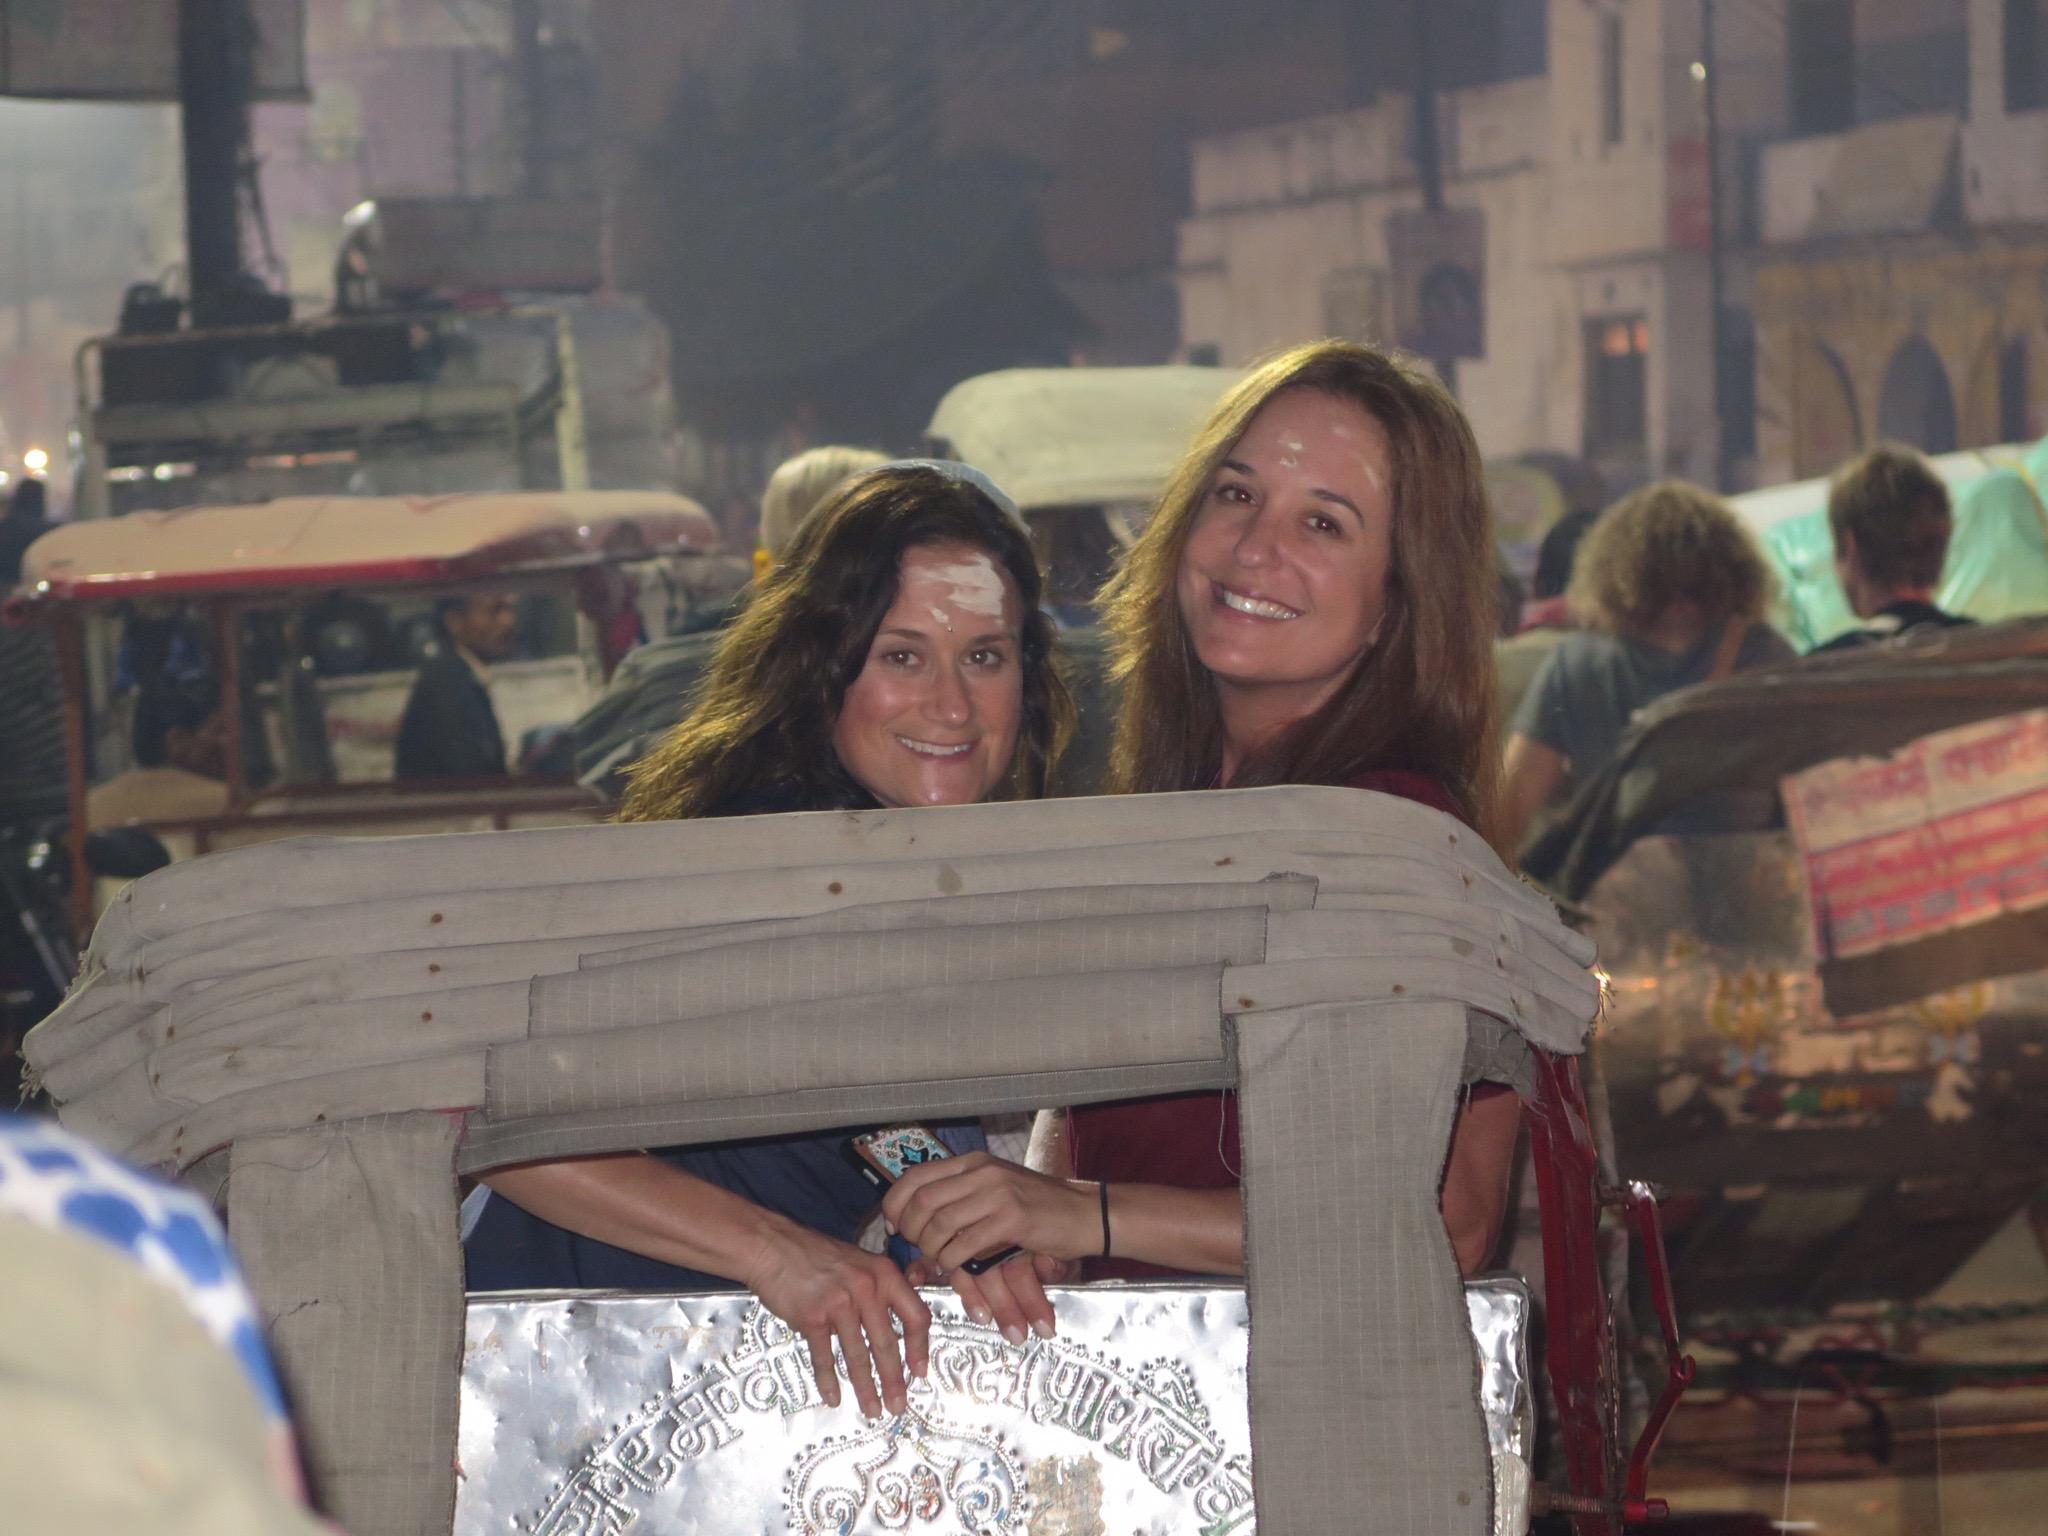 Me and Shel riding rickshaw style in Varanasi